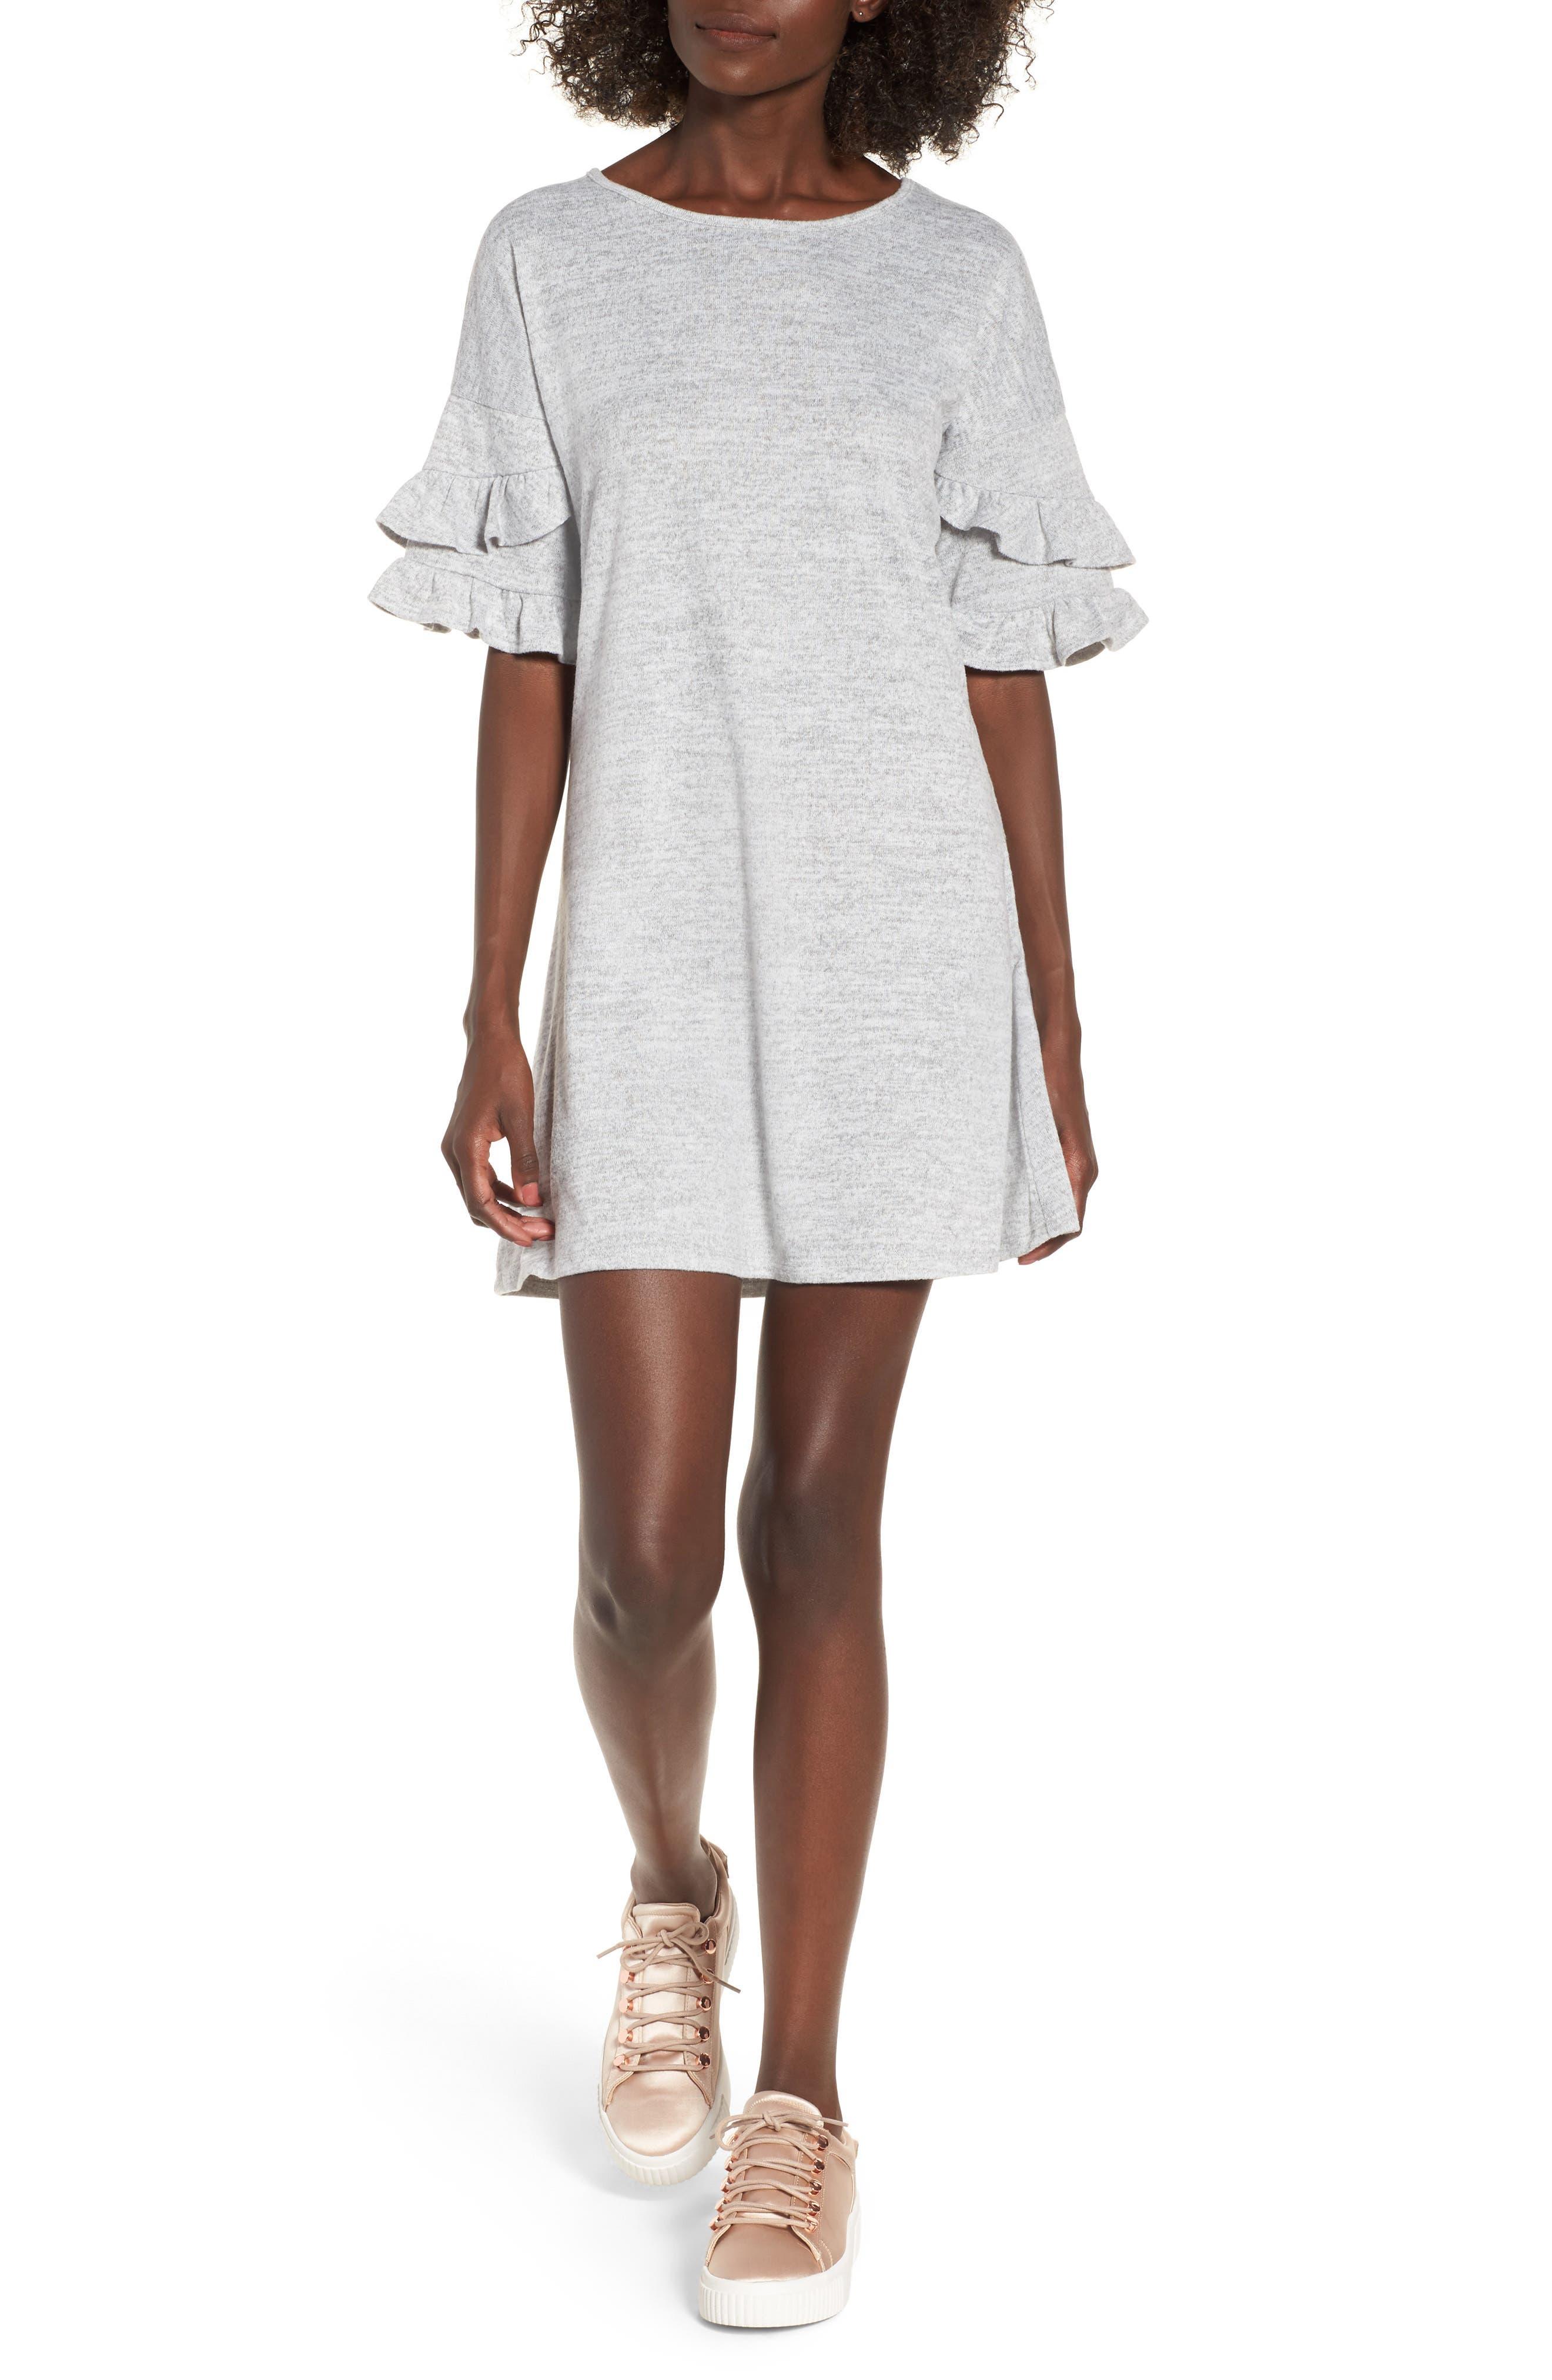 Ruffle Sleeve Sweatshirt Dress,                             Main thumbnail 1, color,                             Heather Grey